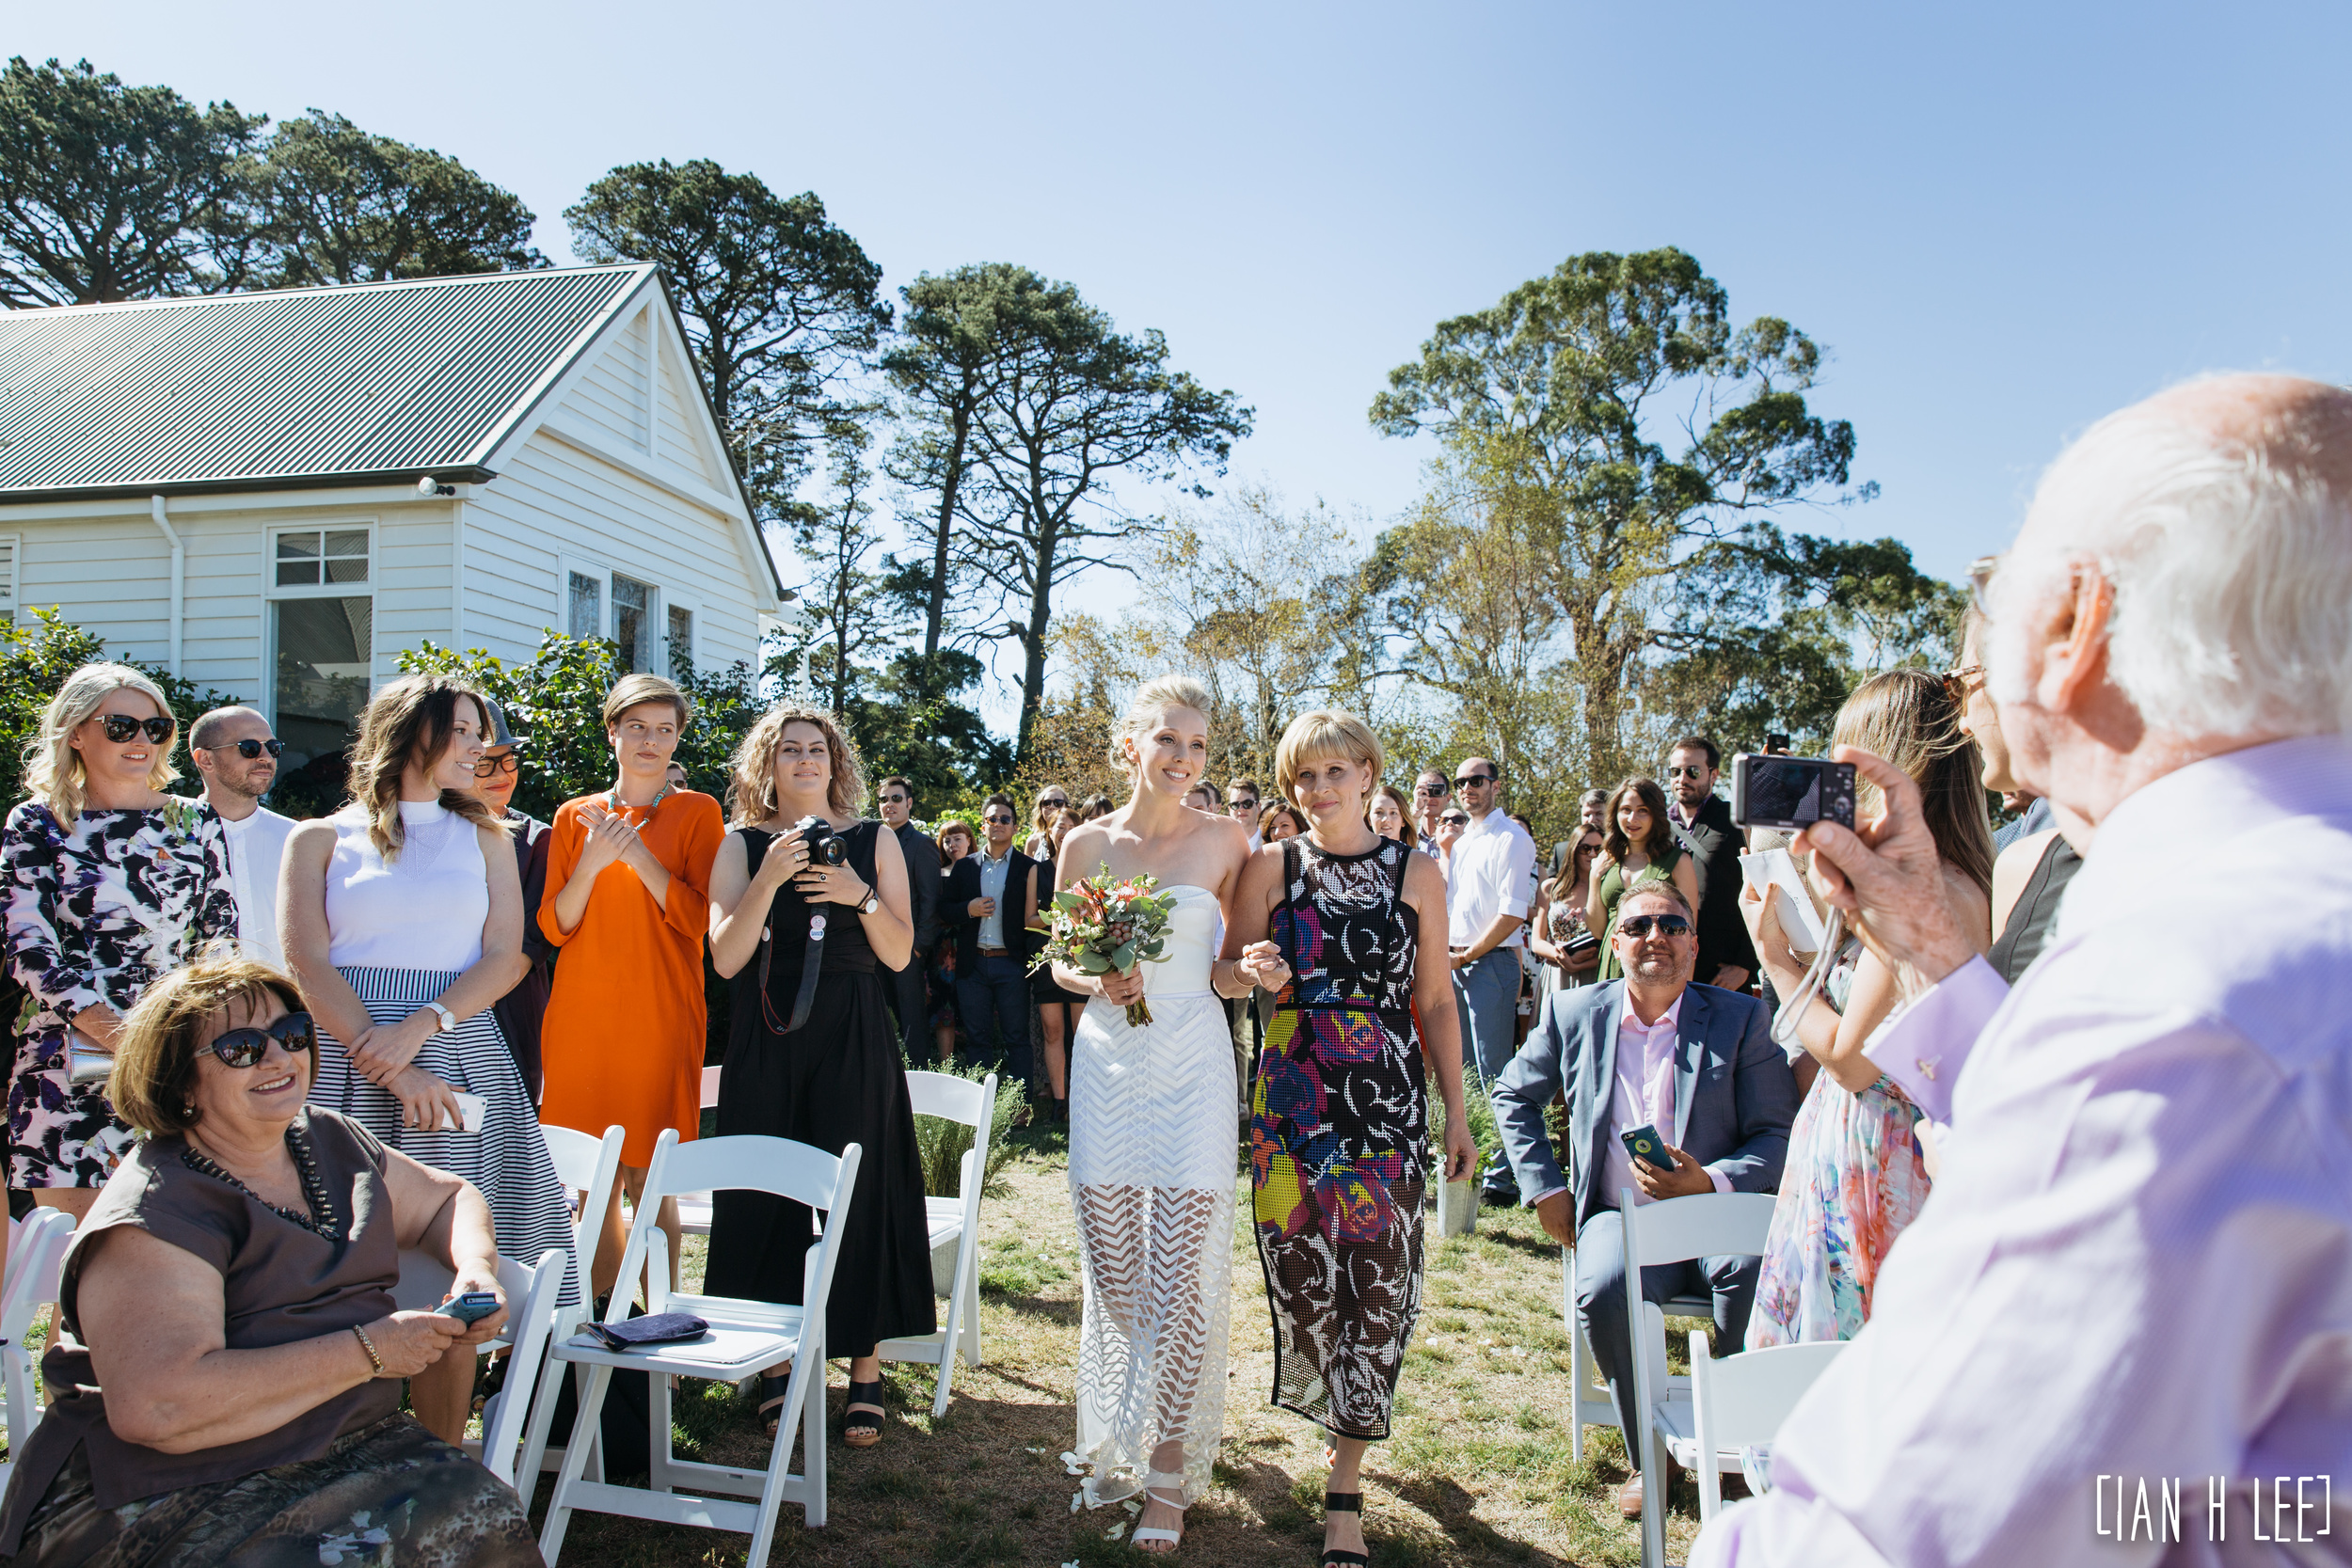 [Ian H Lee] Photography || Weddings - Melbourne || Ewan And Courtney -9540.jpg